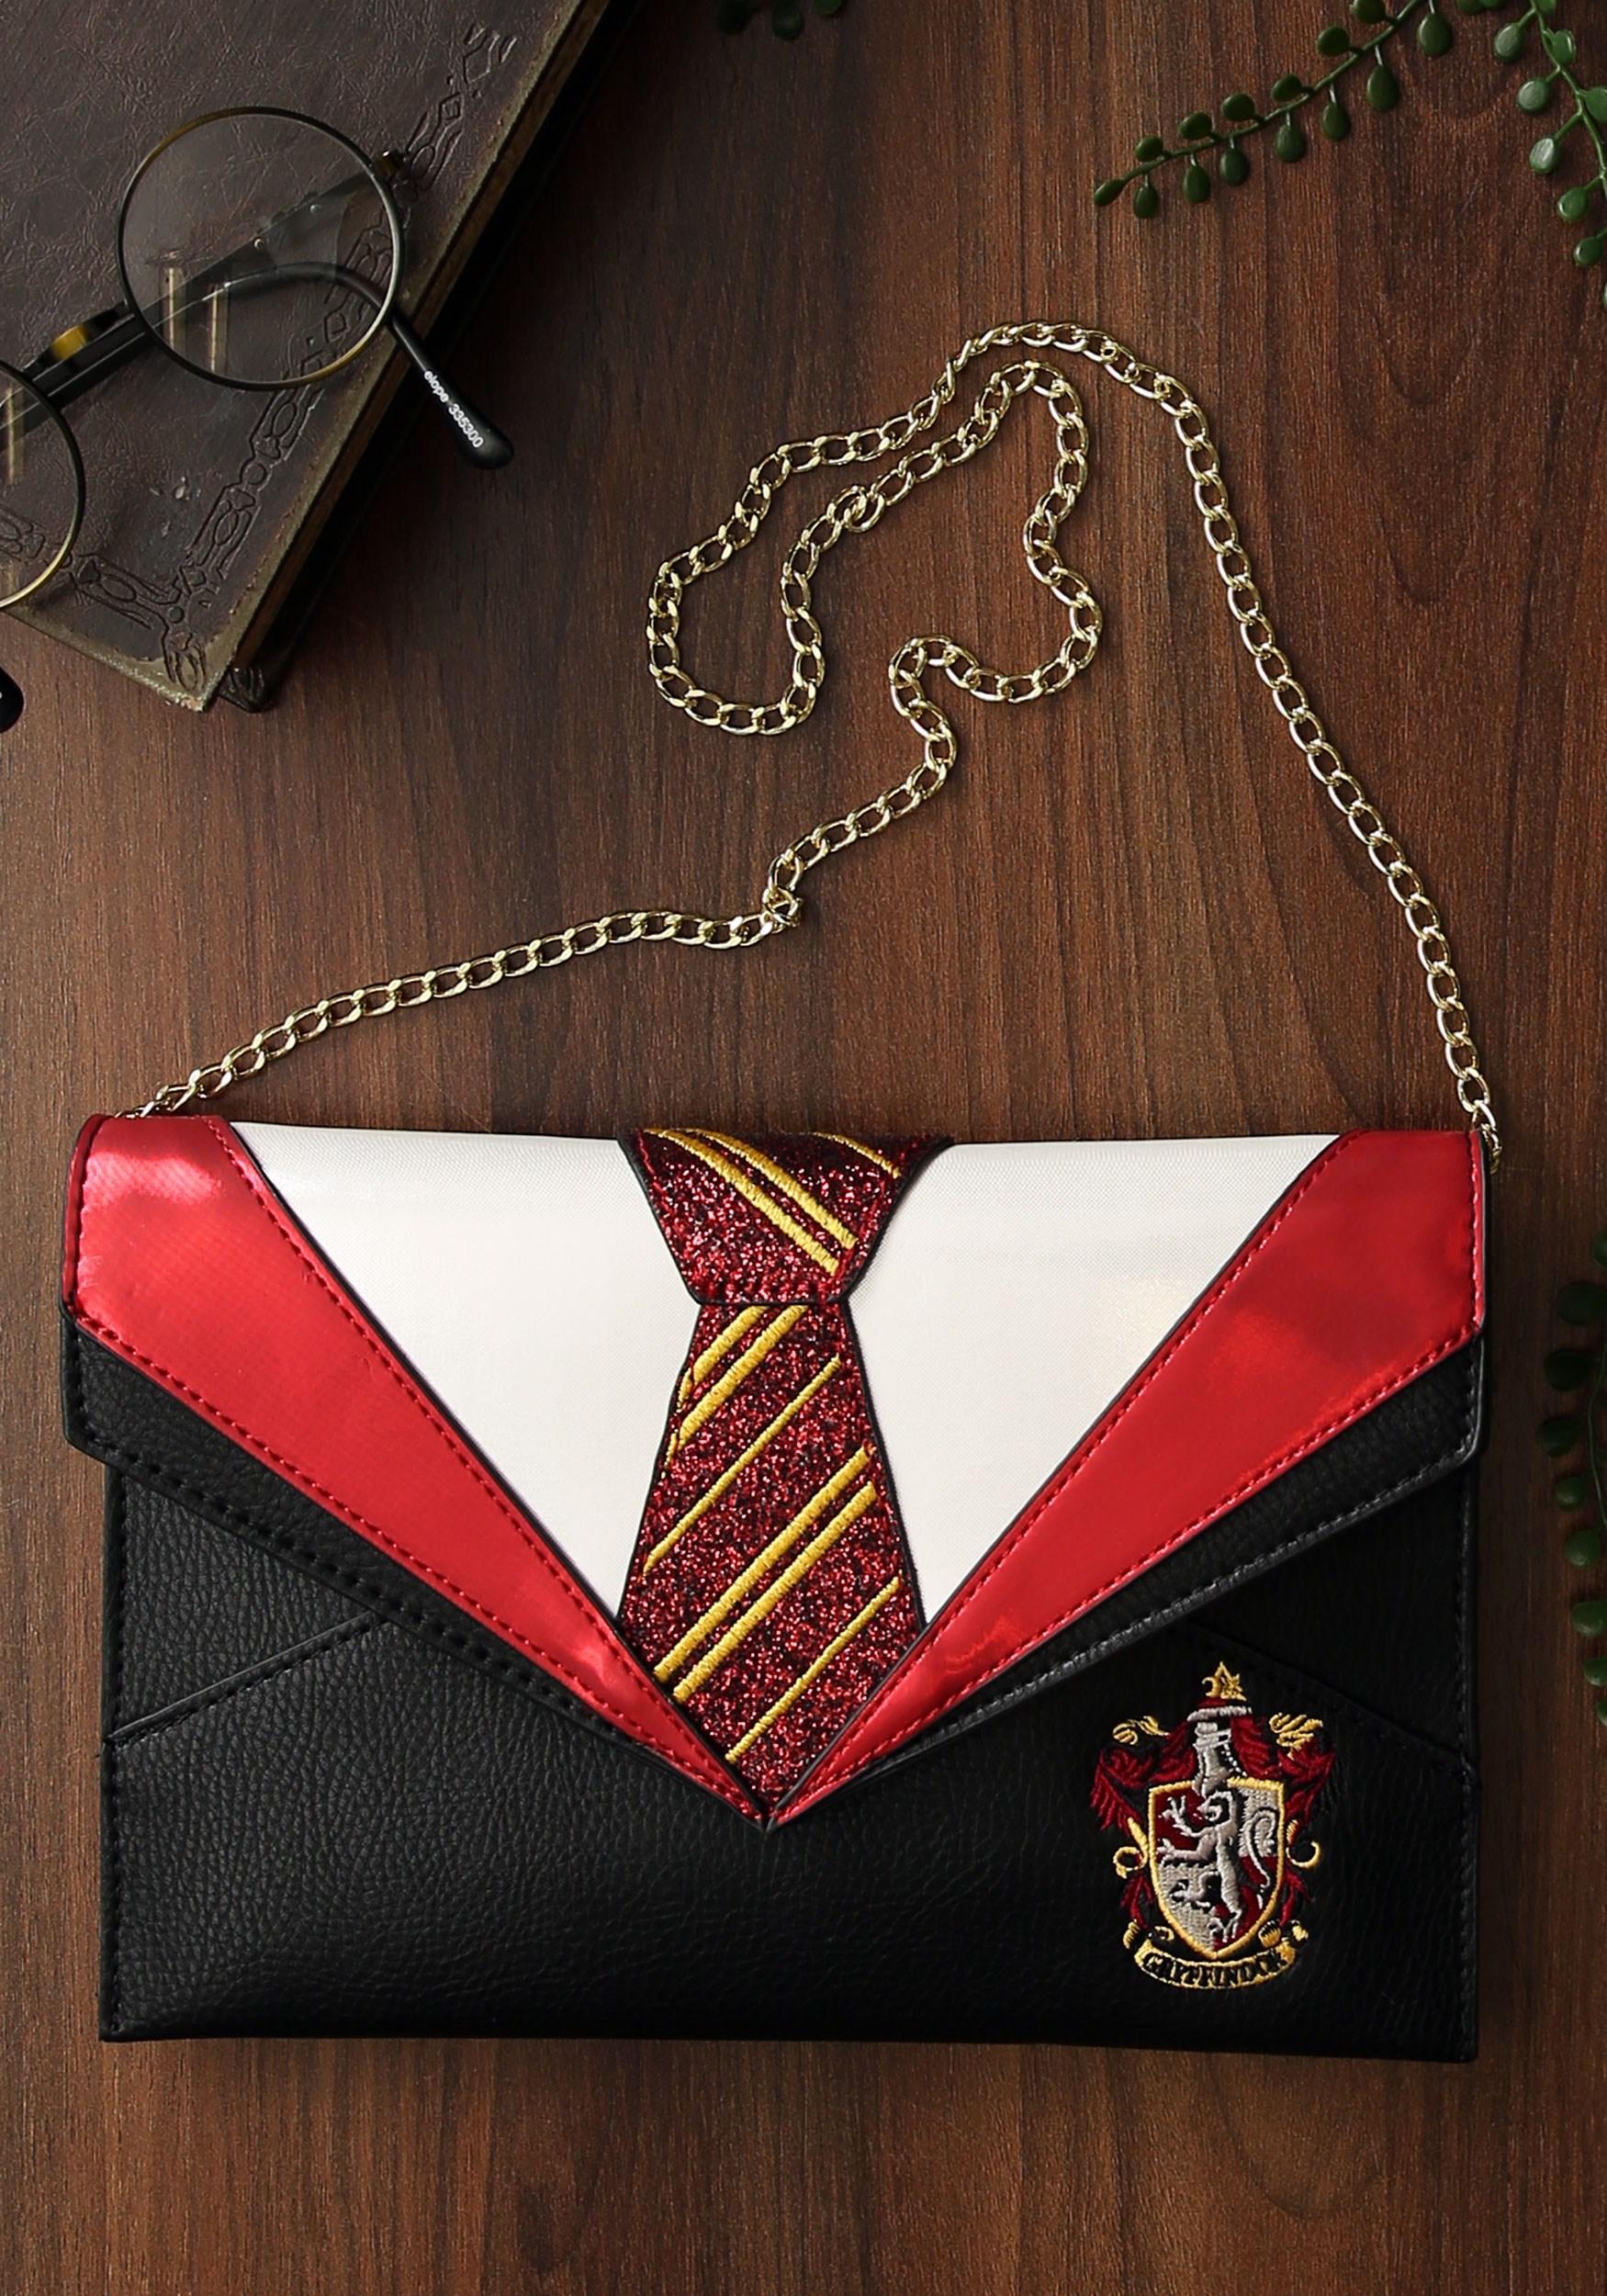 Danielle Nicole Harry Potter Gryffindor Clutch Purse (FABDN174815-ST FABDN174815) photo